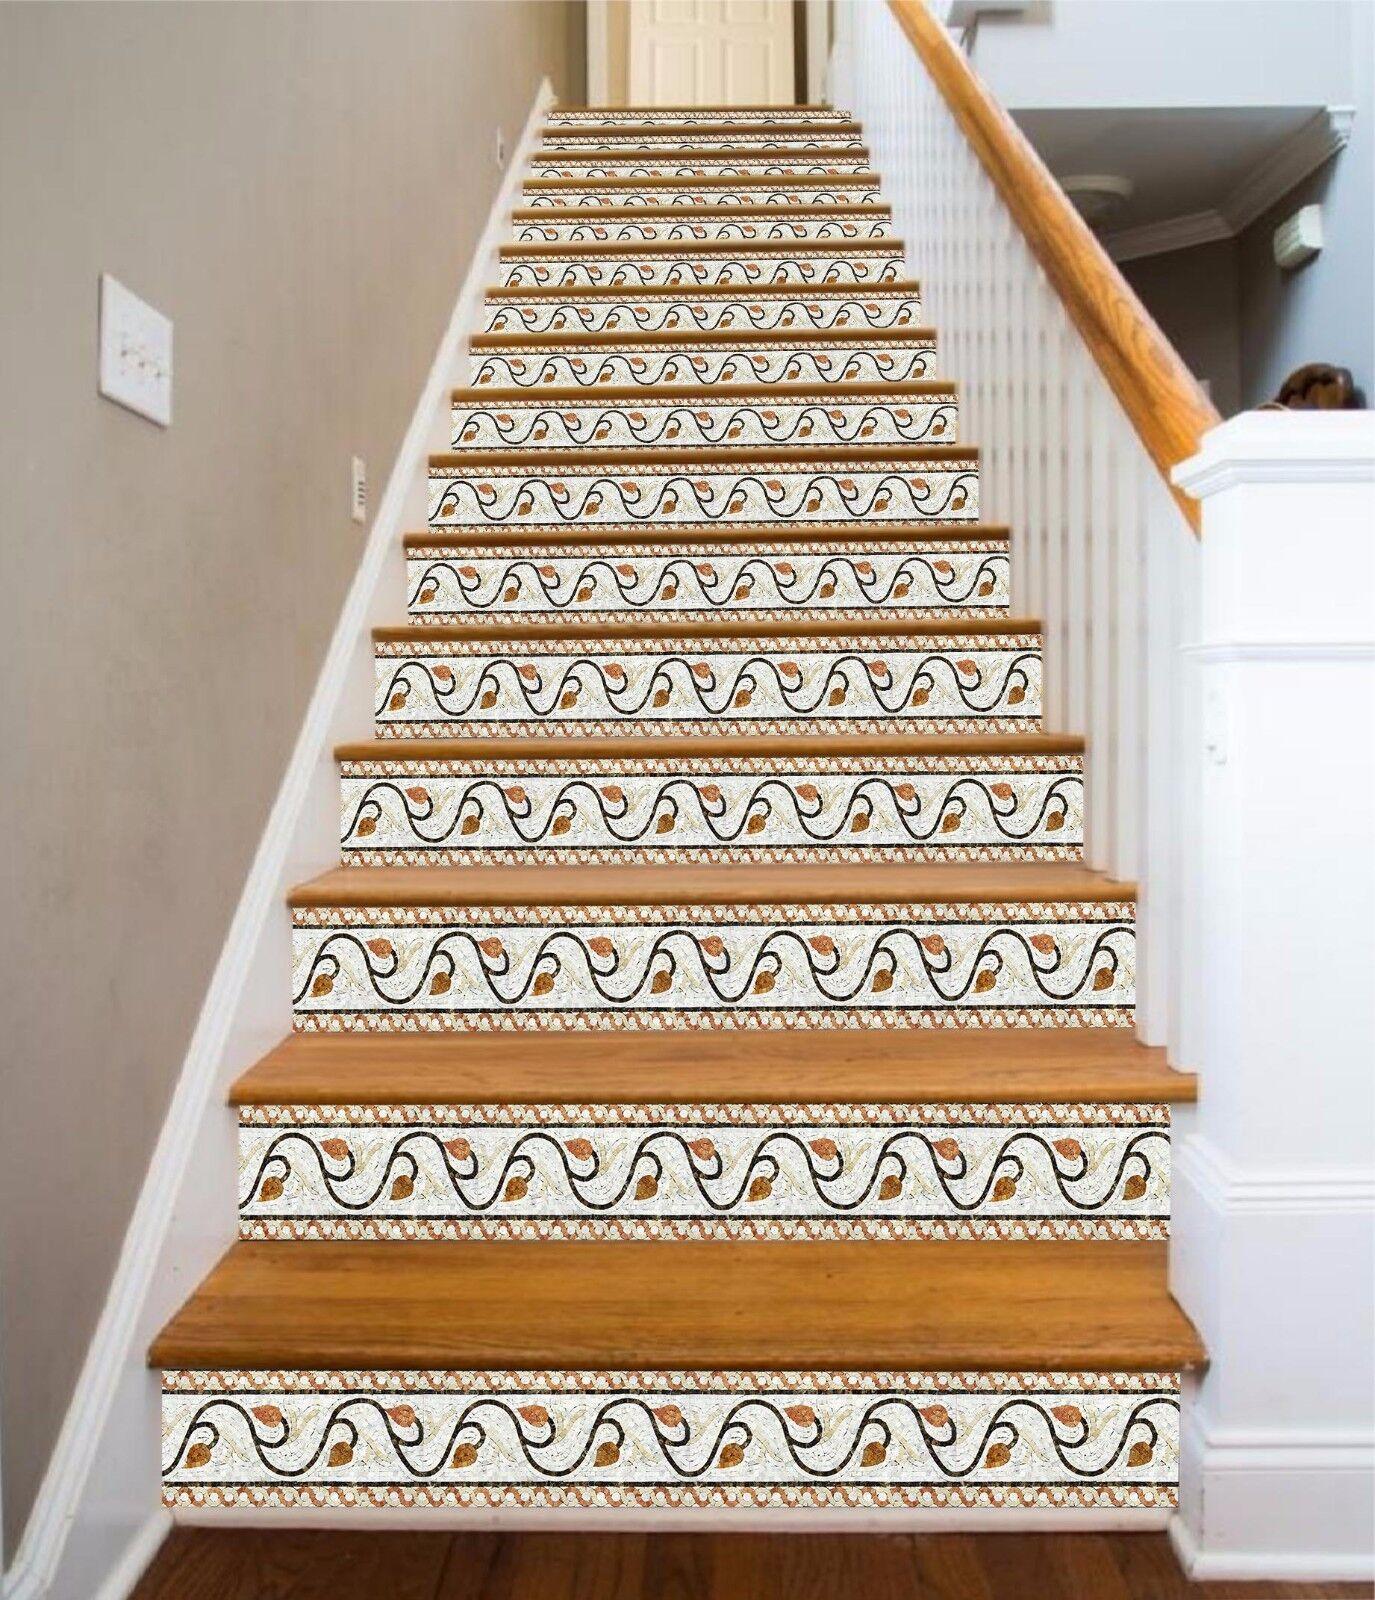 3D Stones Vine 023 Stair Risers Decoration Photo Mural Vinyl Decal Wallpaper AU